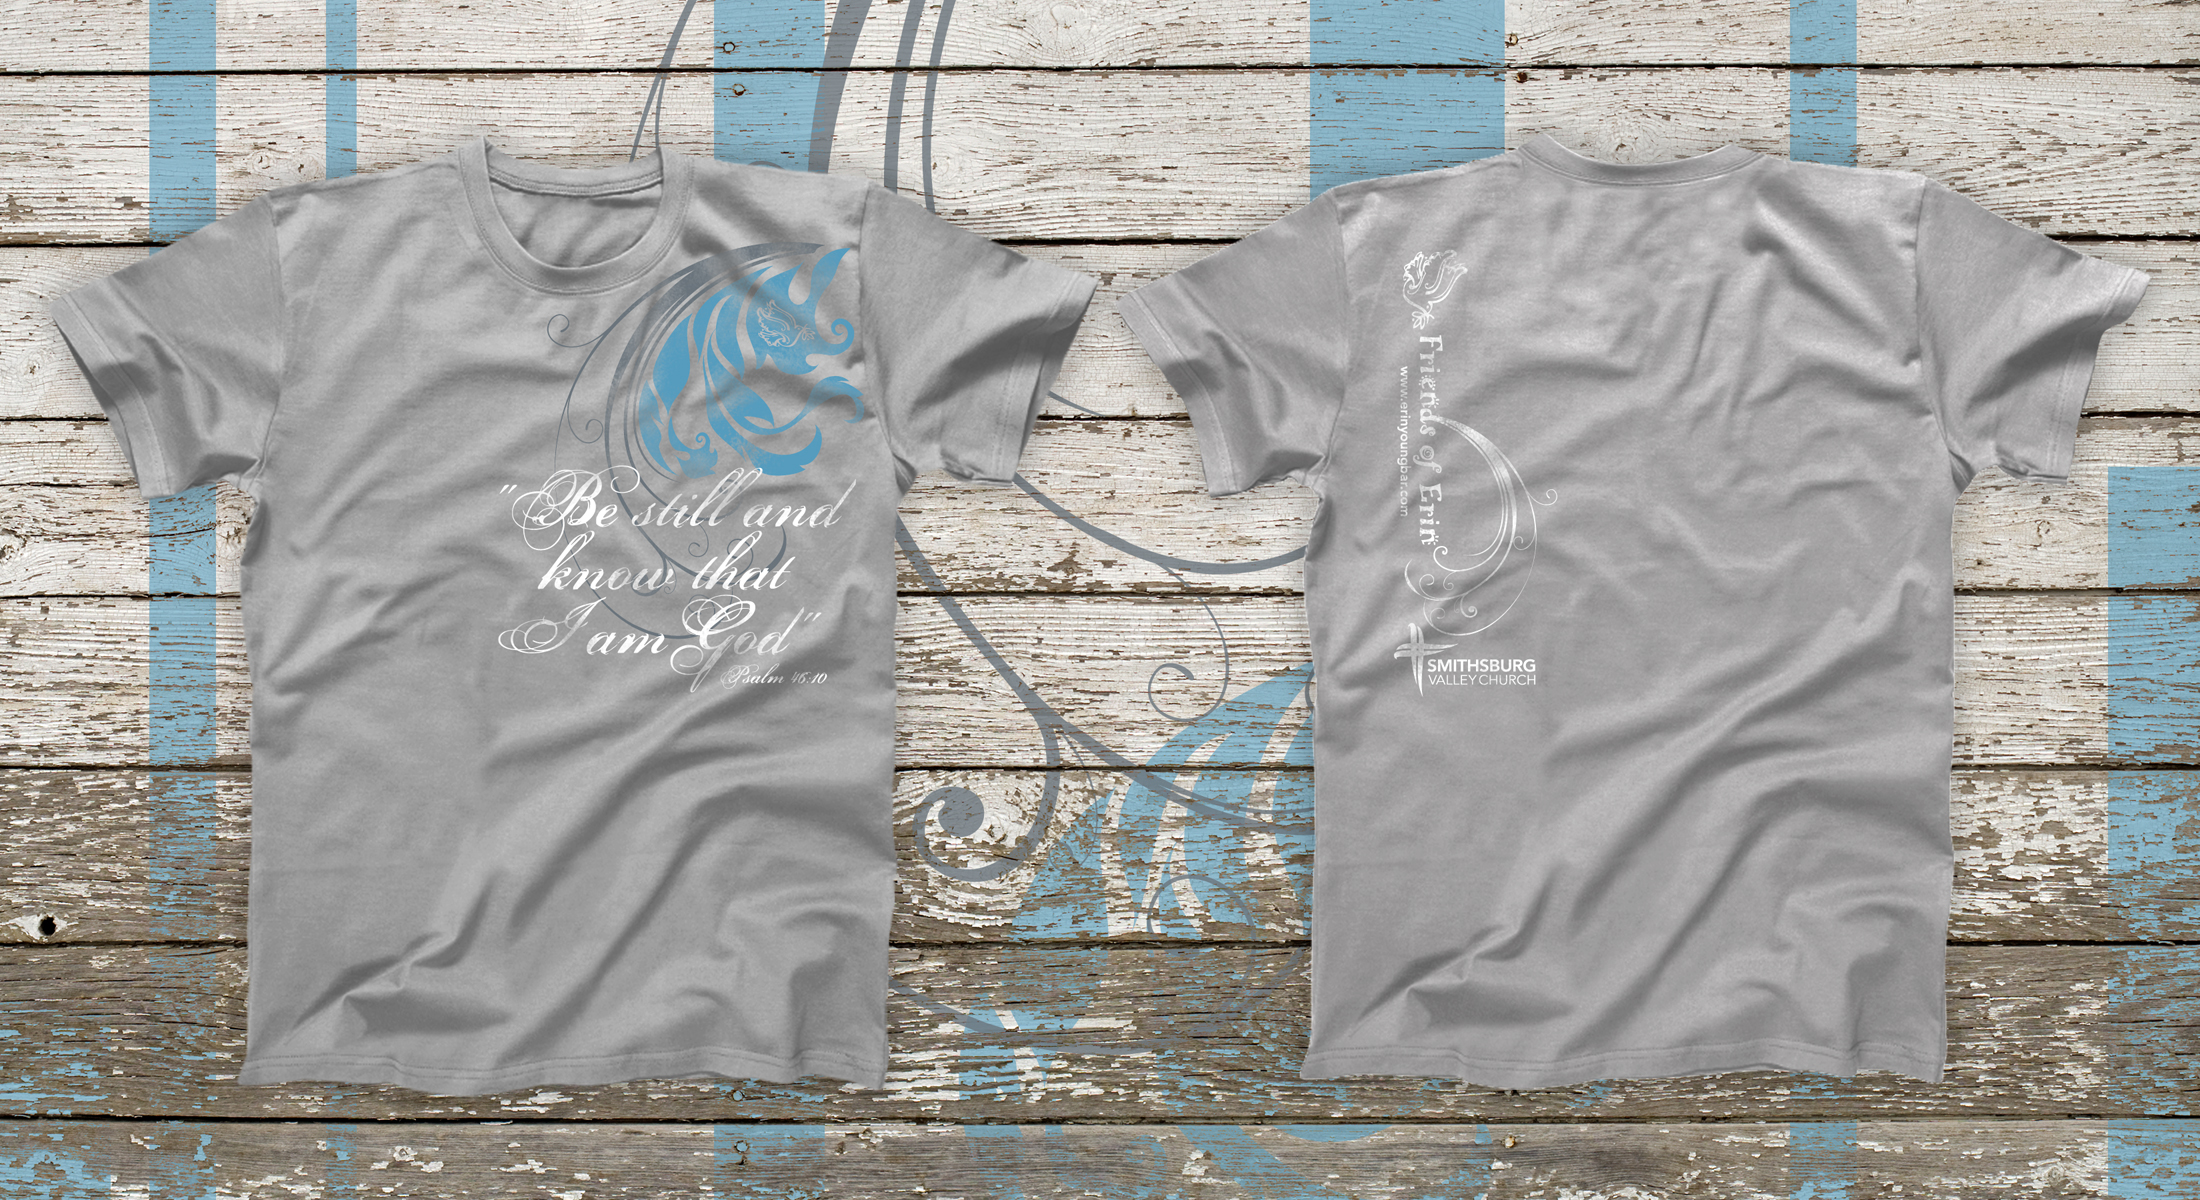 20130322 FriendsOfErin Shirt PROOF.jpg